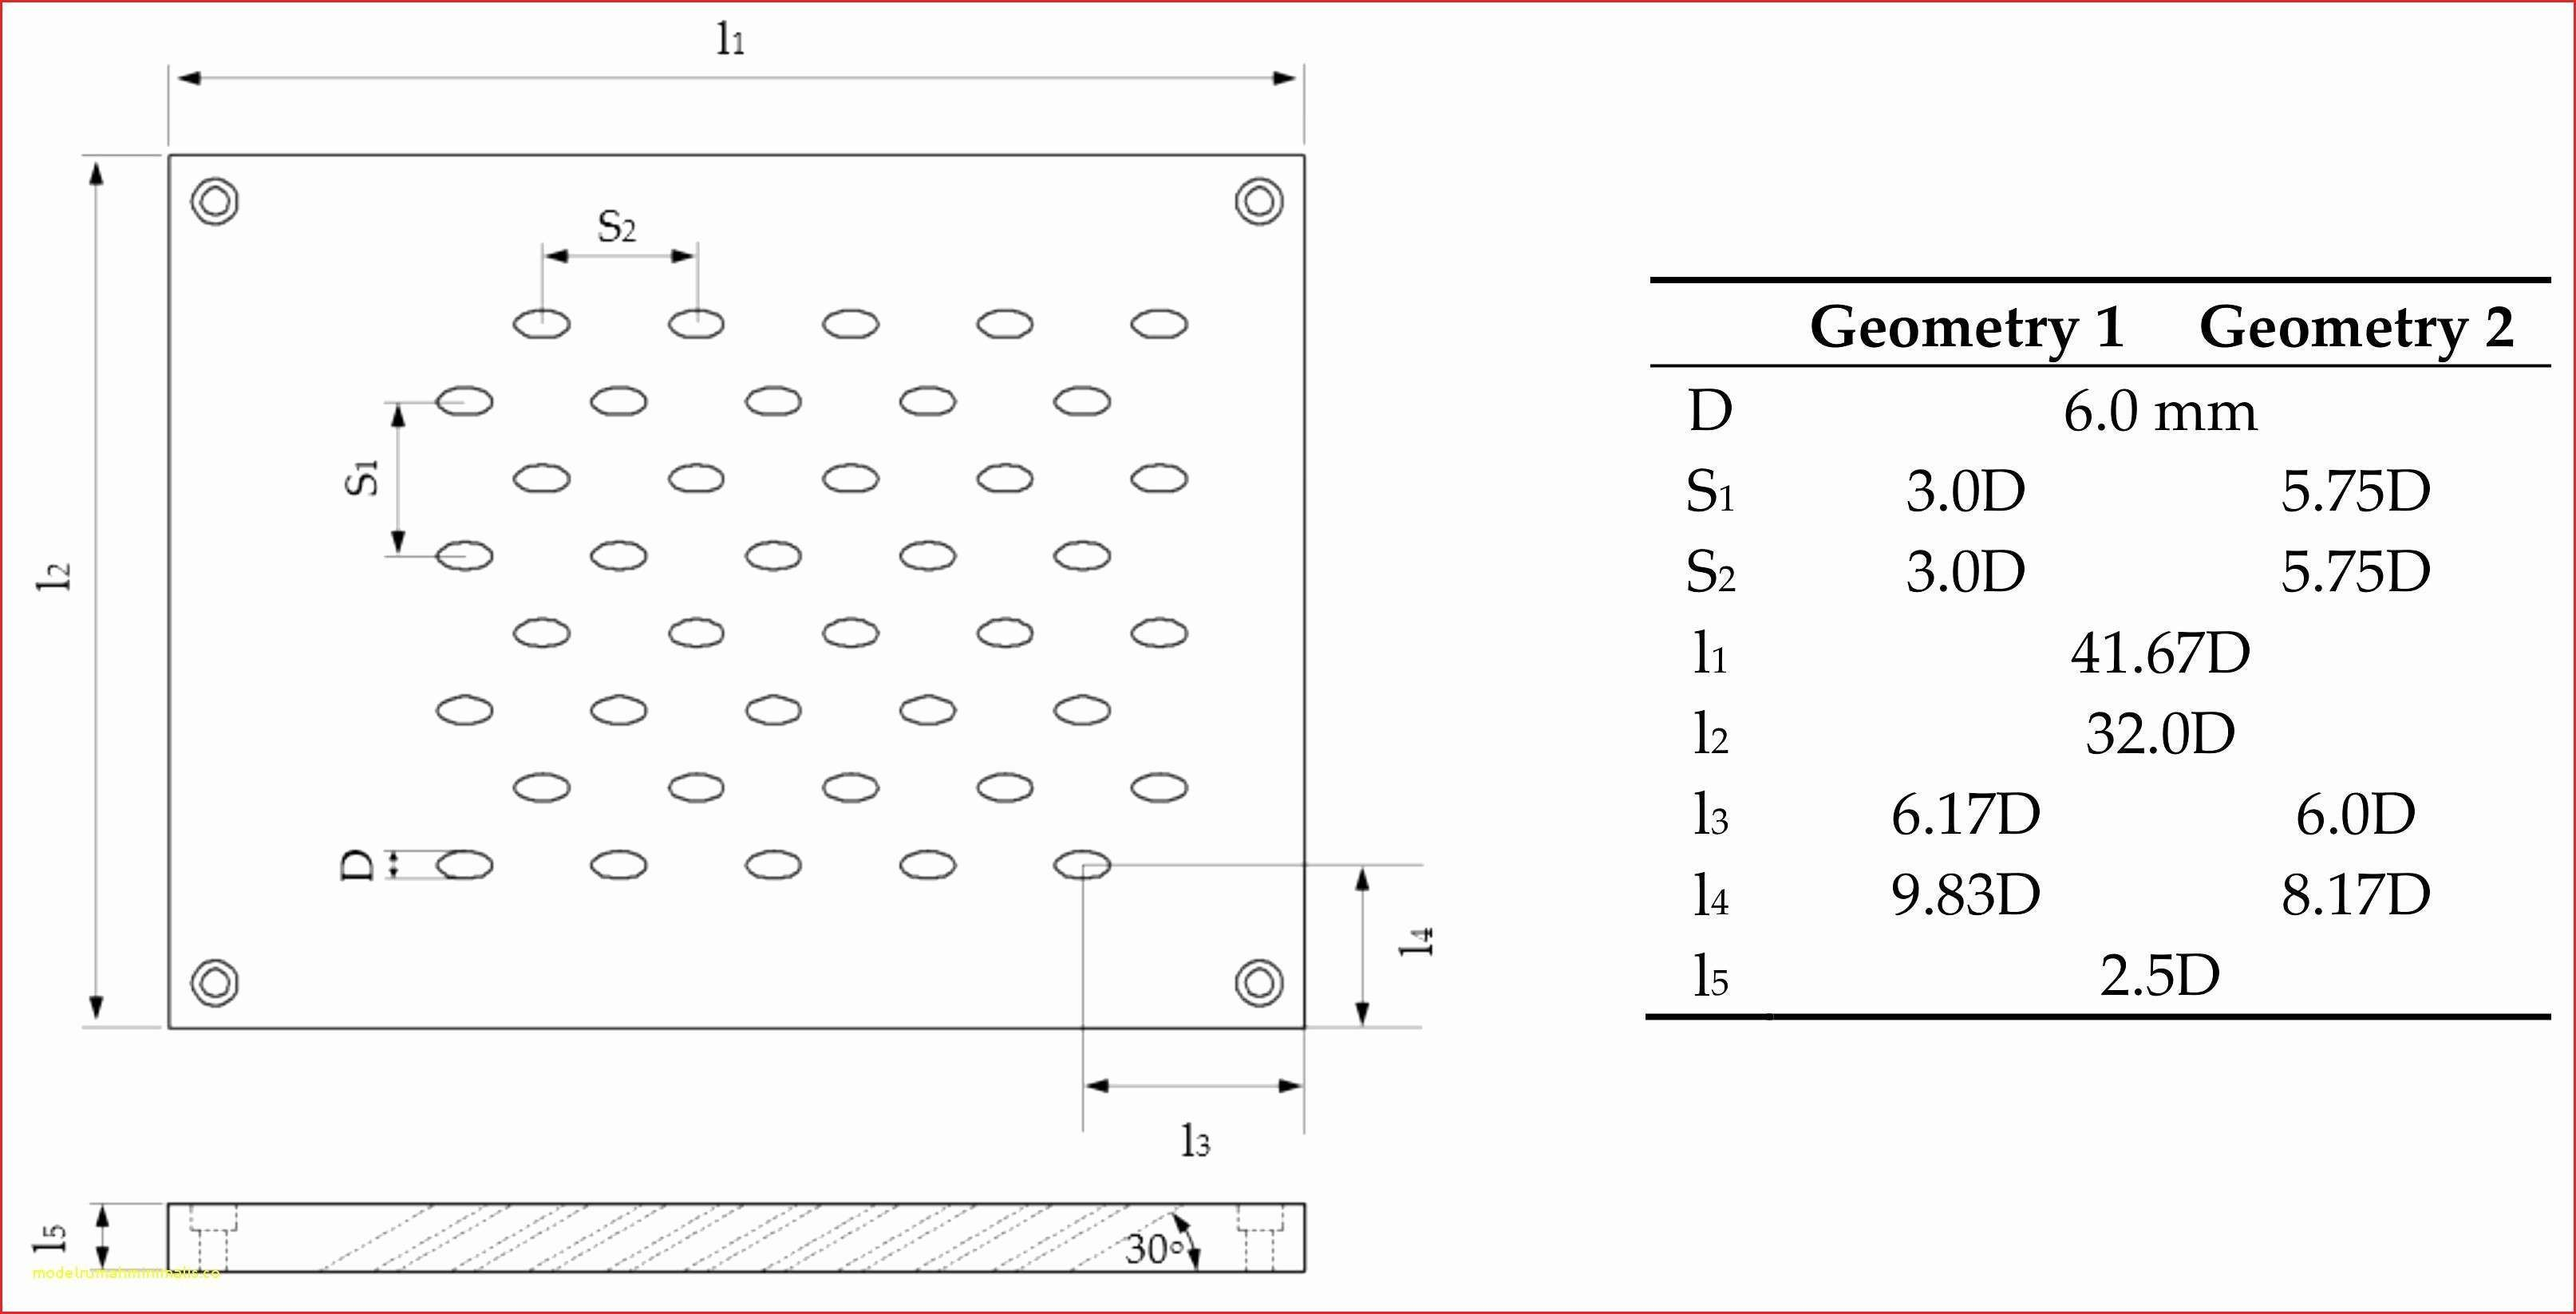 Corel Draw Business Card Template Corel Draw Free S Resume Corel Draw Best Resume Templates R In 2020 Label Templates Math Worksheets Resume Template